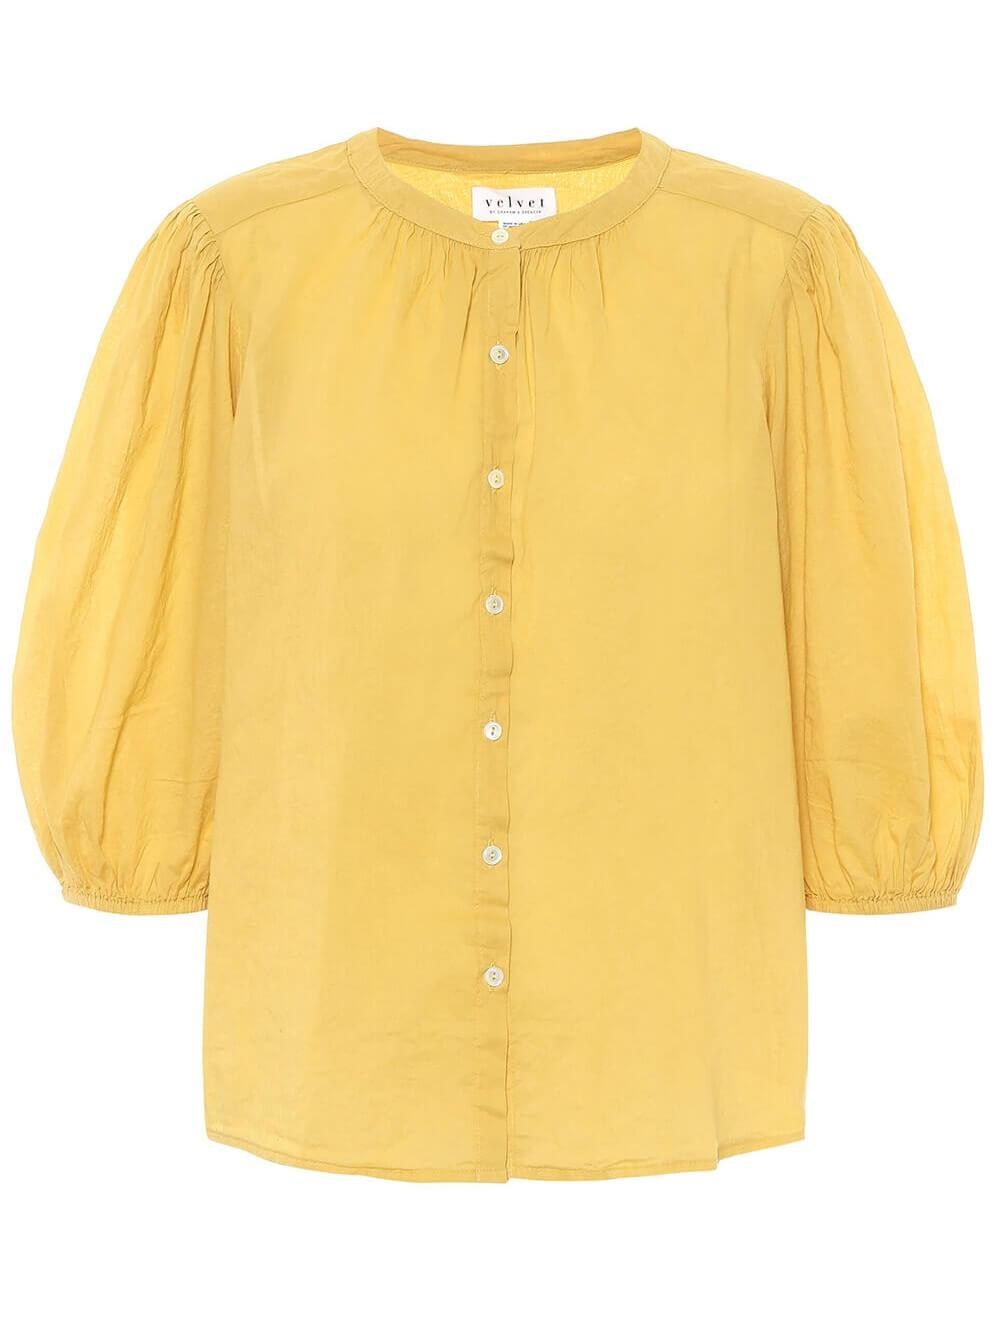 Emberly Half Sleeve Buttondown Item # EMBERLY04